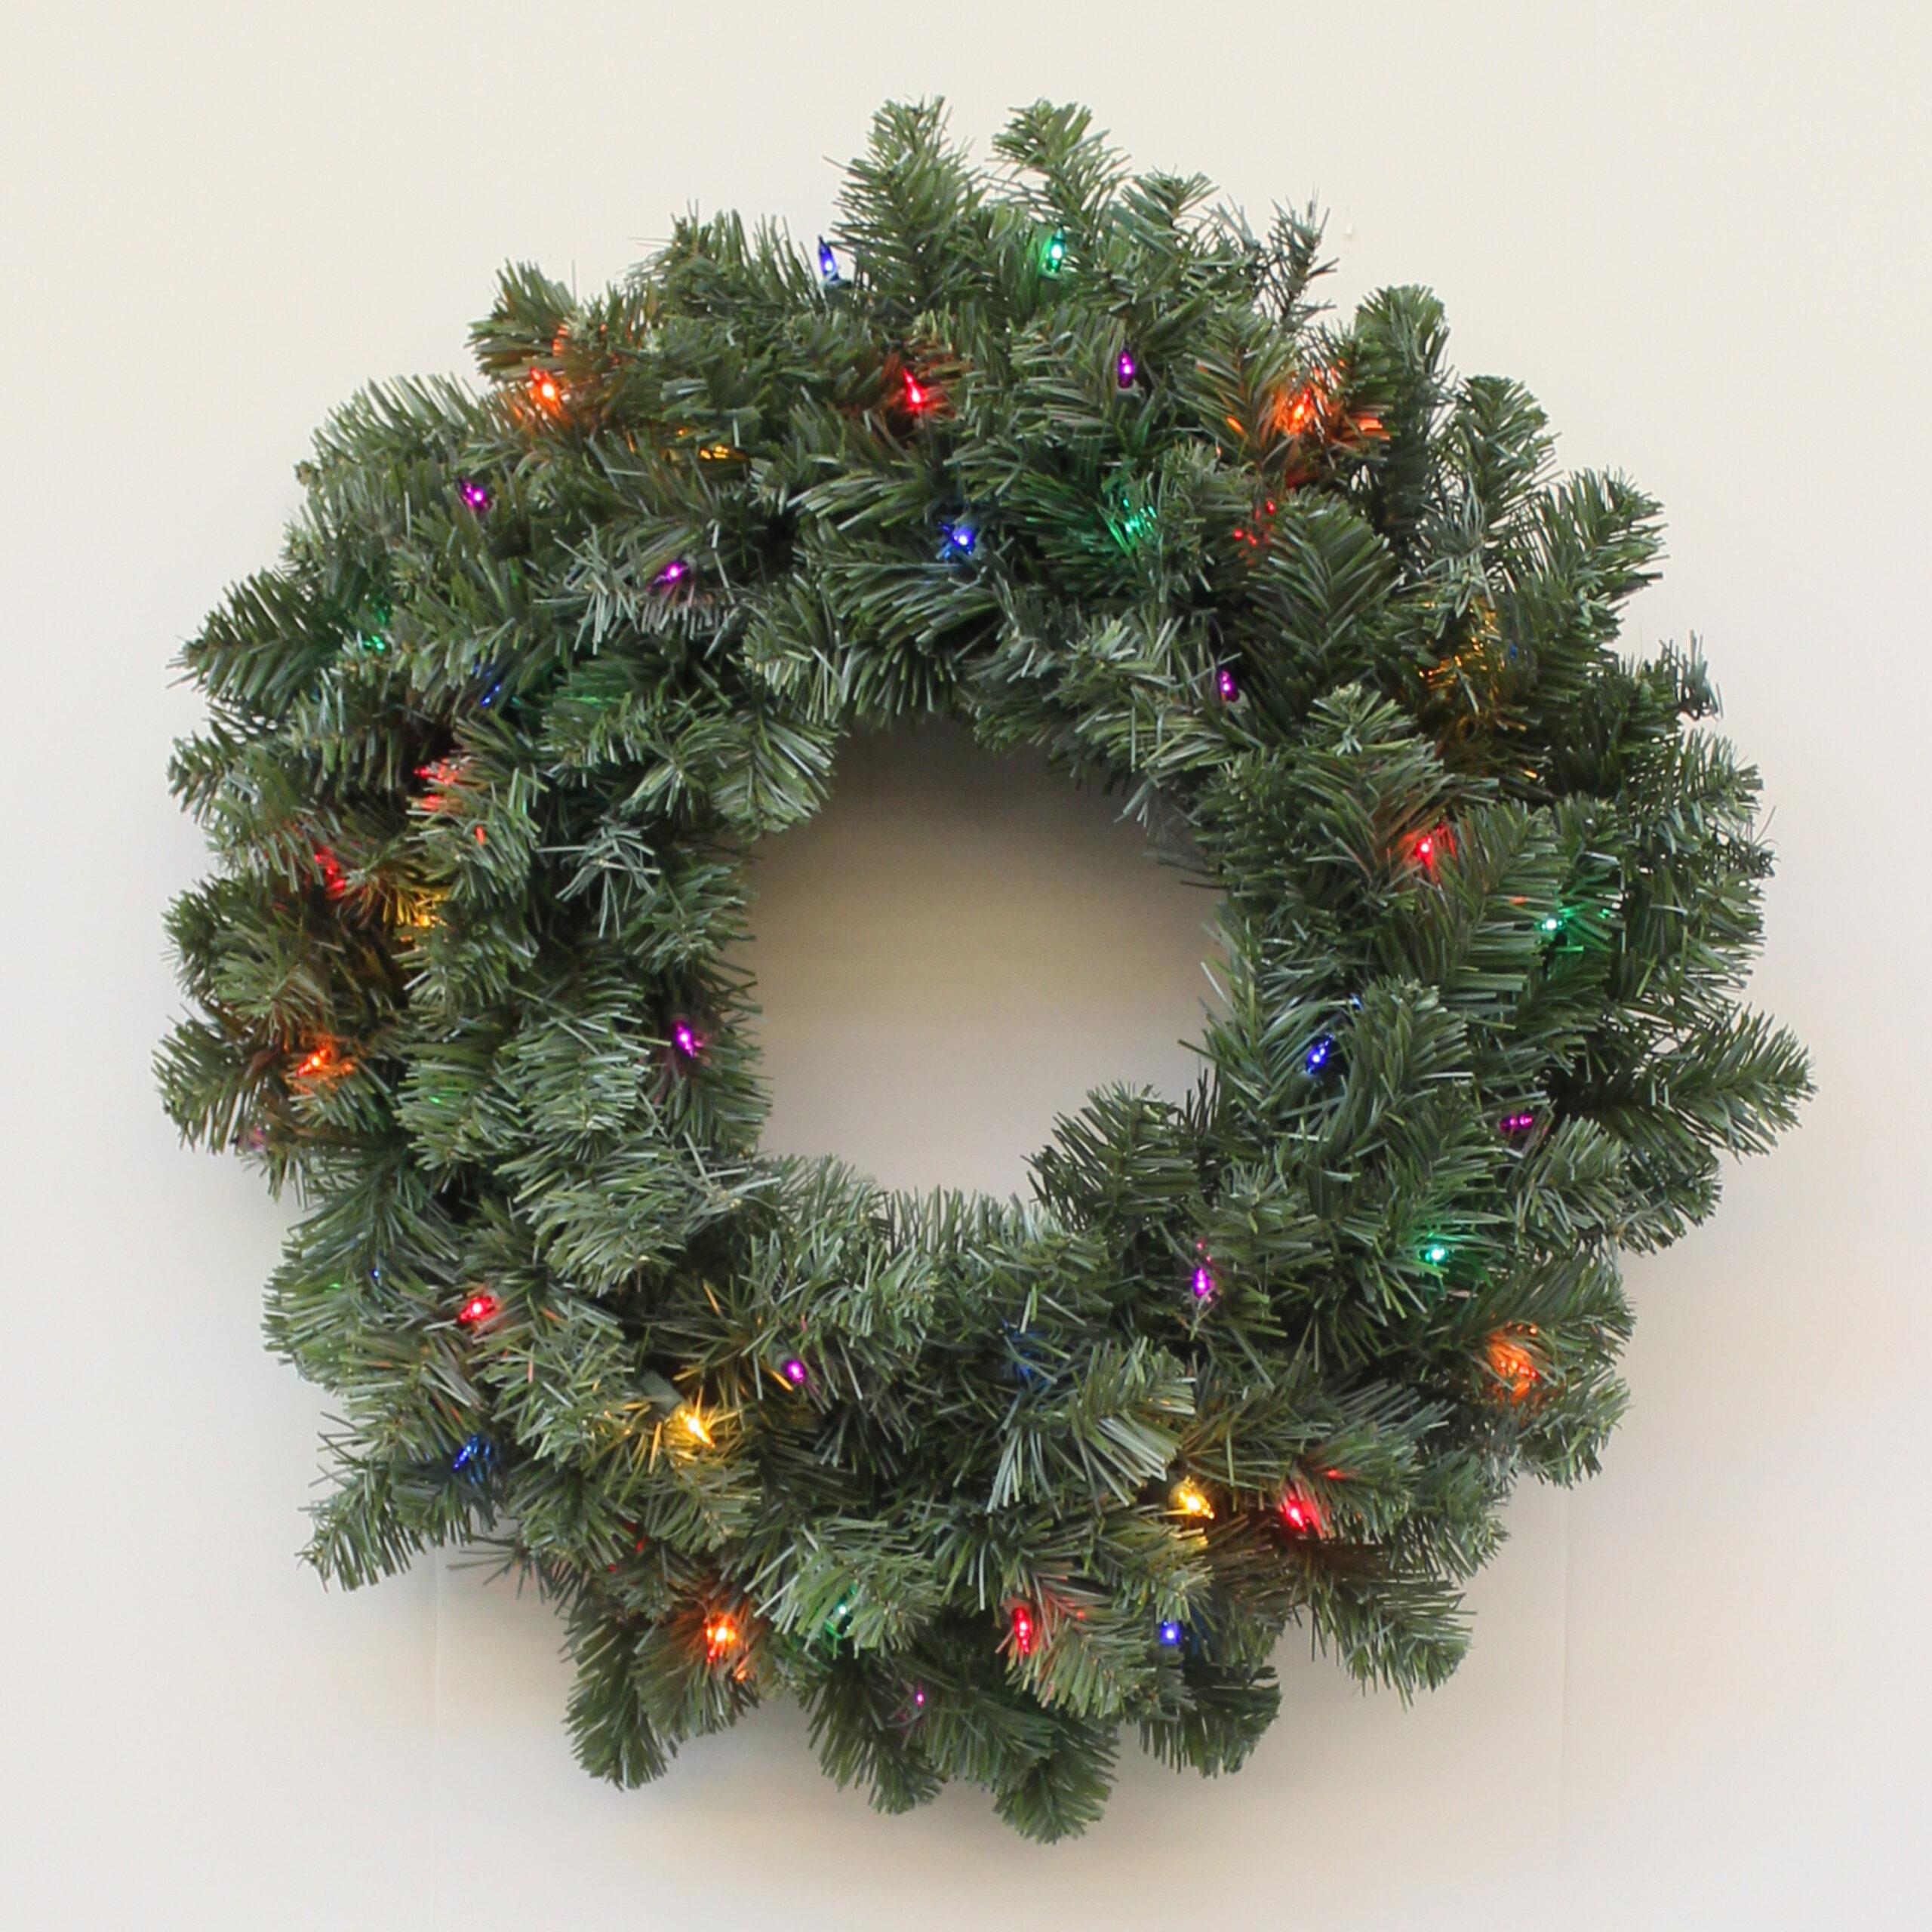 75819 Northern Douglas Fir Artificial Christmas Wreath Multi Incandescent Lights English Gardens